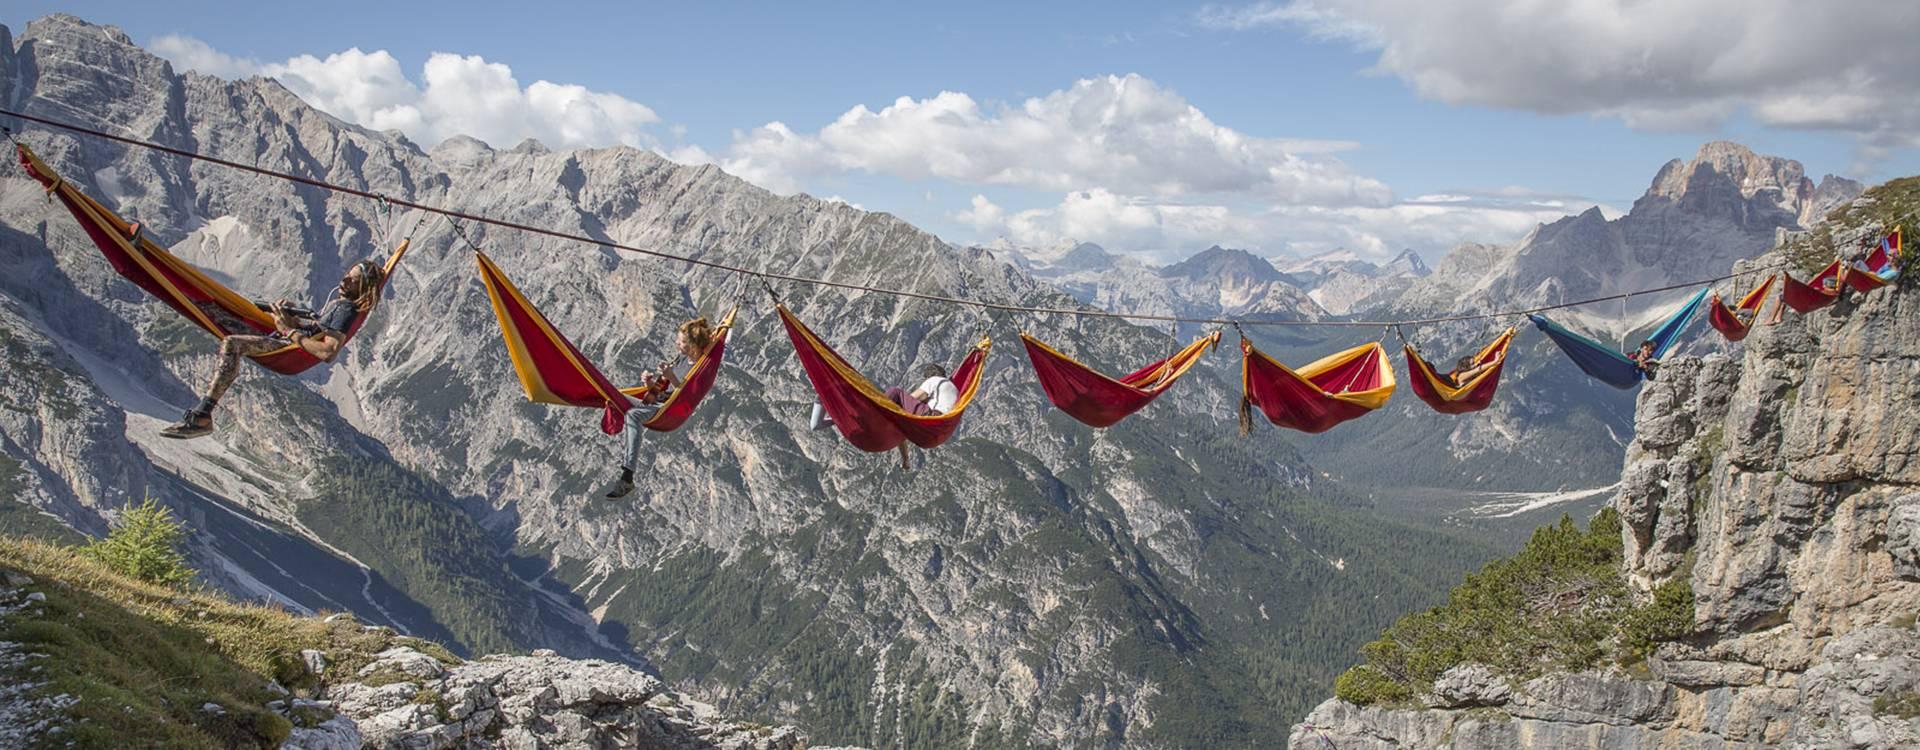 startpage-slideshow3-montepiana-hammock-wahlhuetter-web-4-ticket-to-the-moon-hammock-manufacturer-camping-sebastian-walhuetter